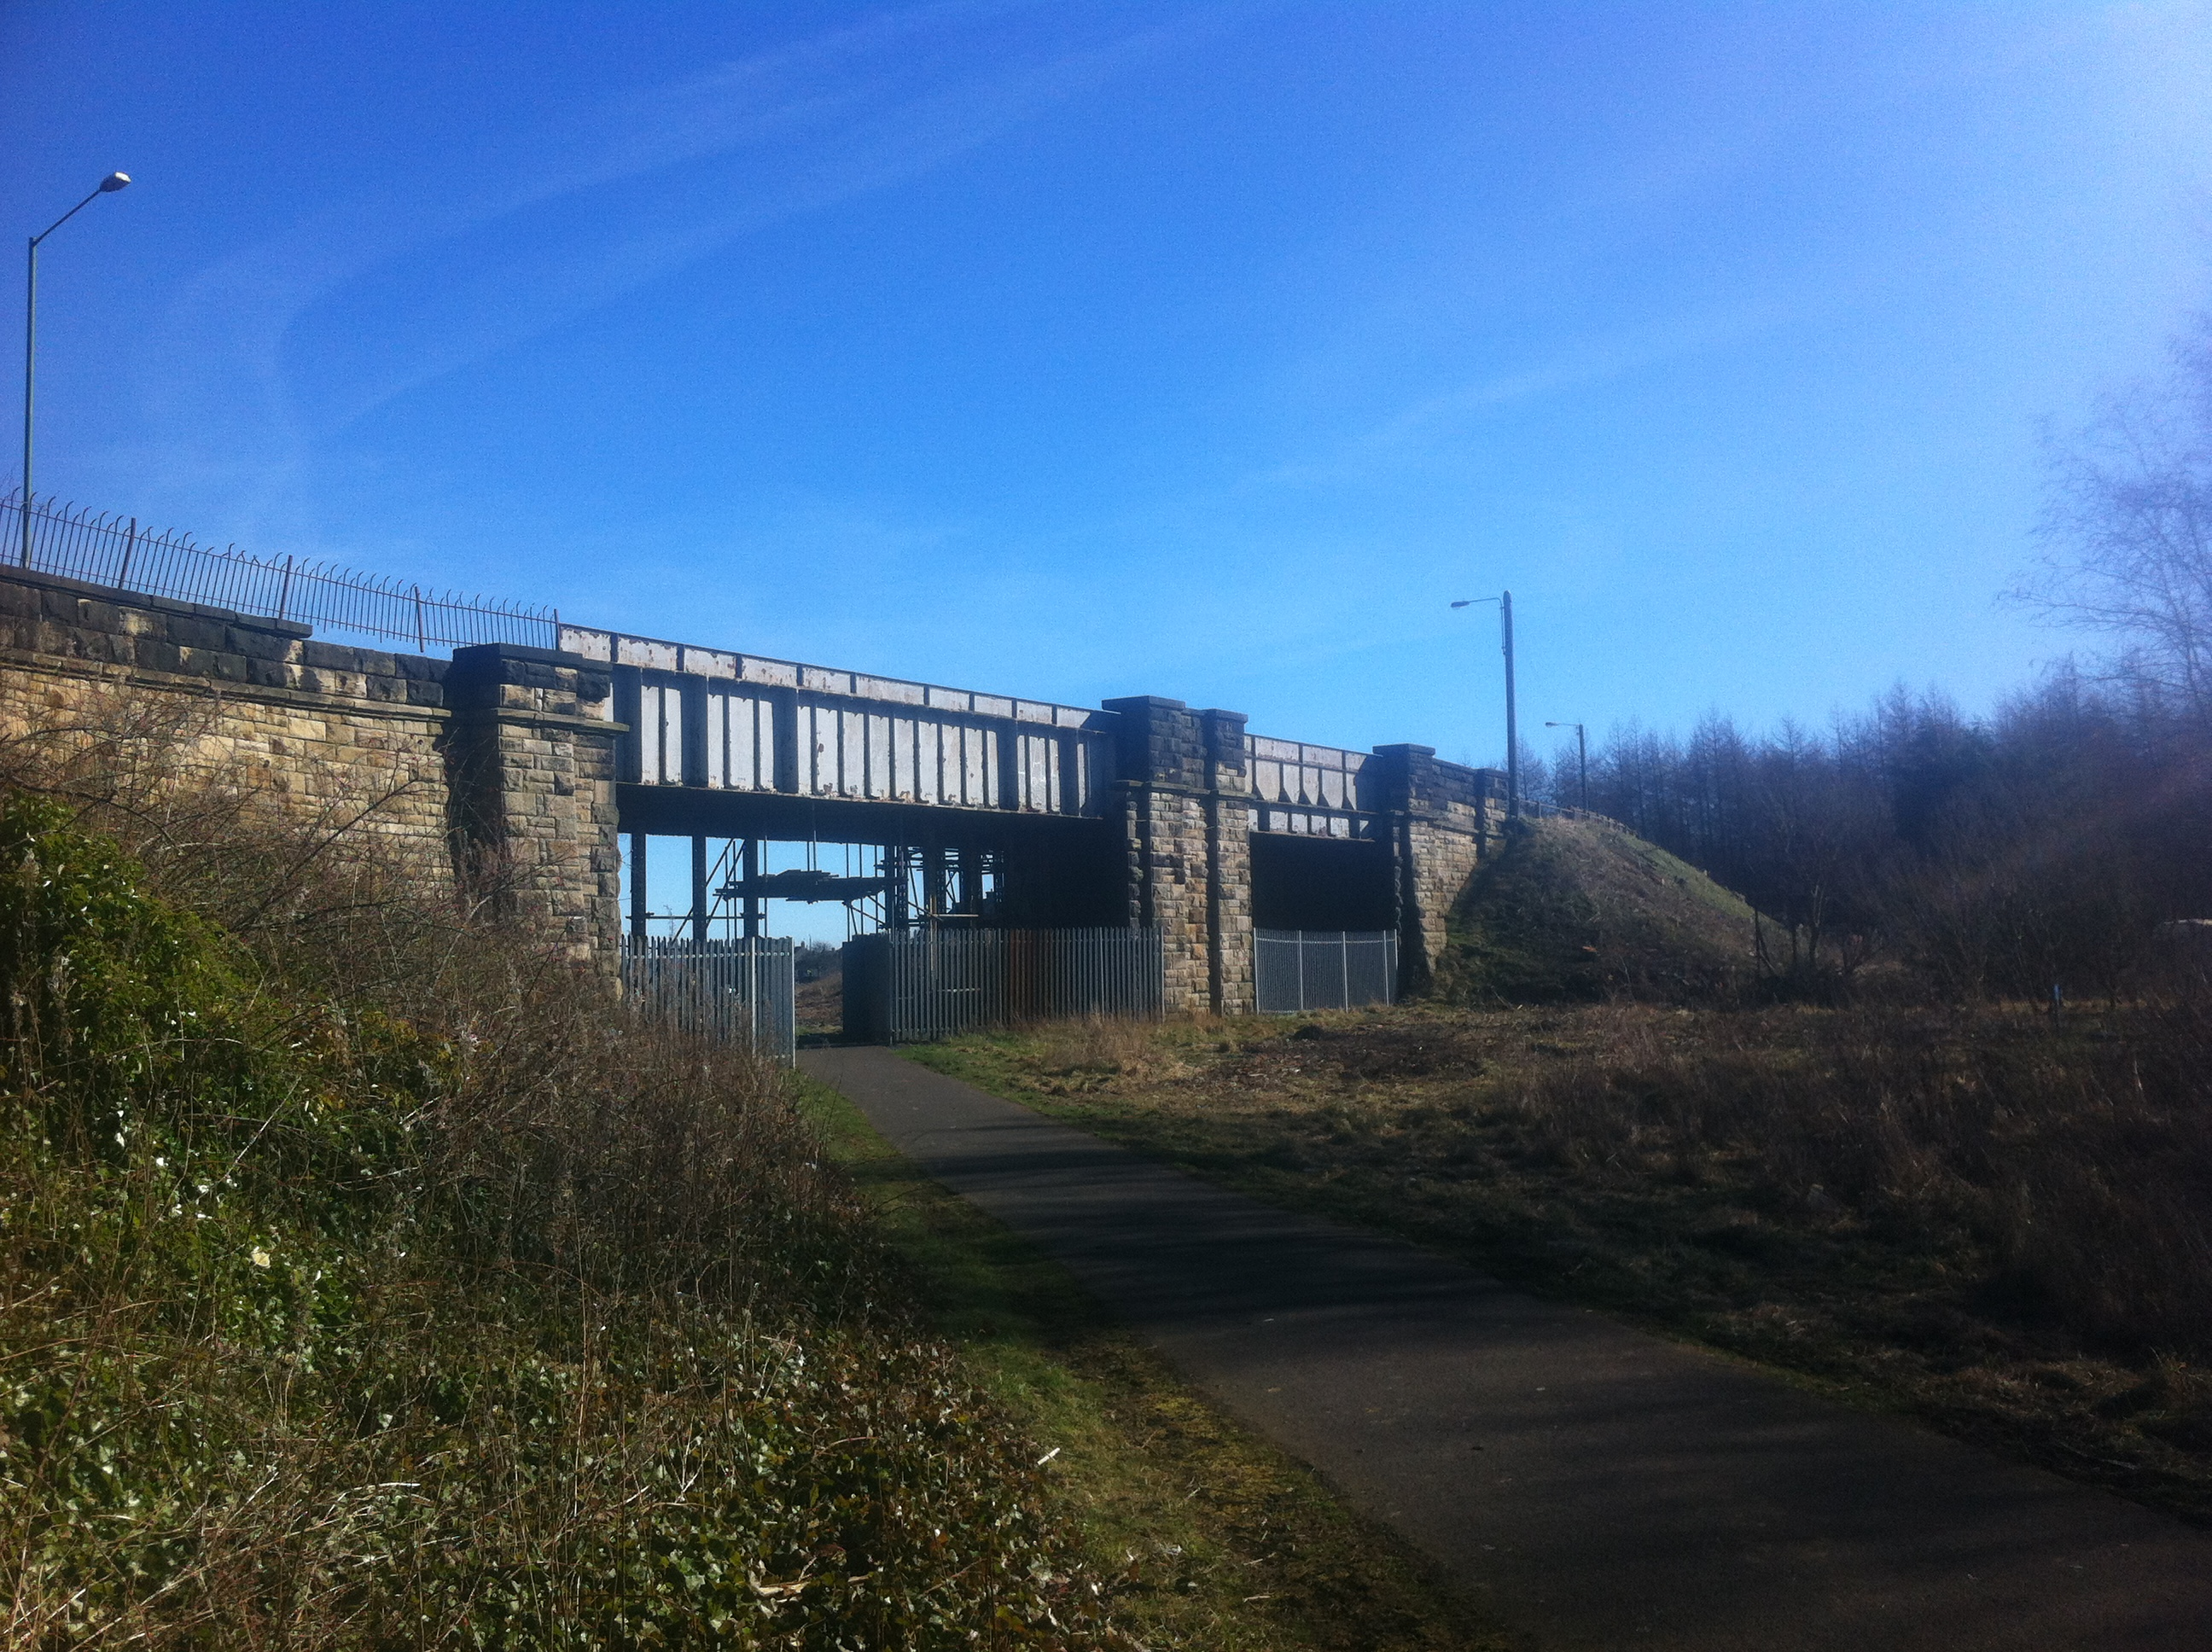 Bridge at Leadgate 1